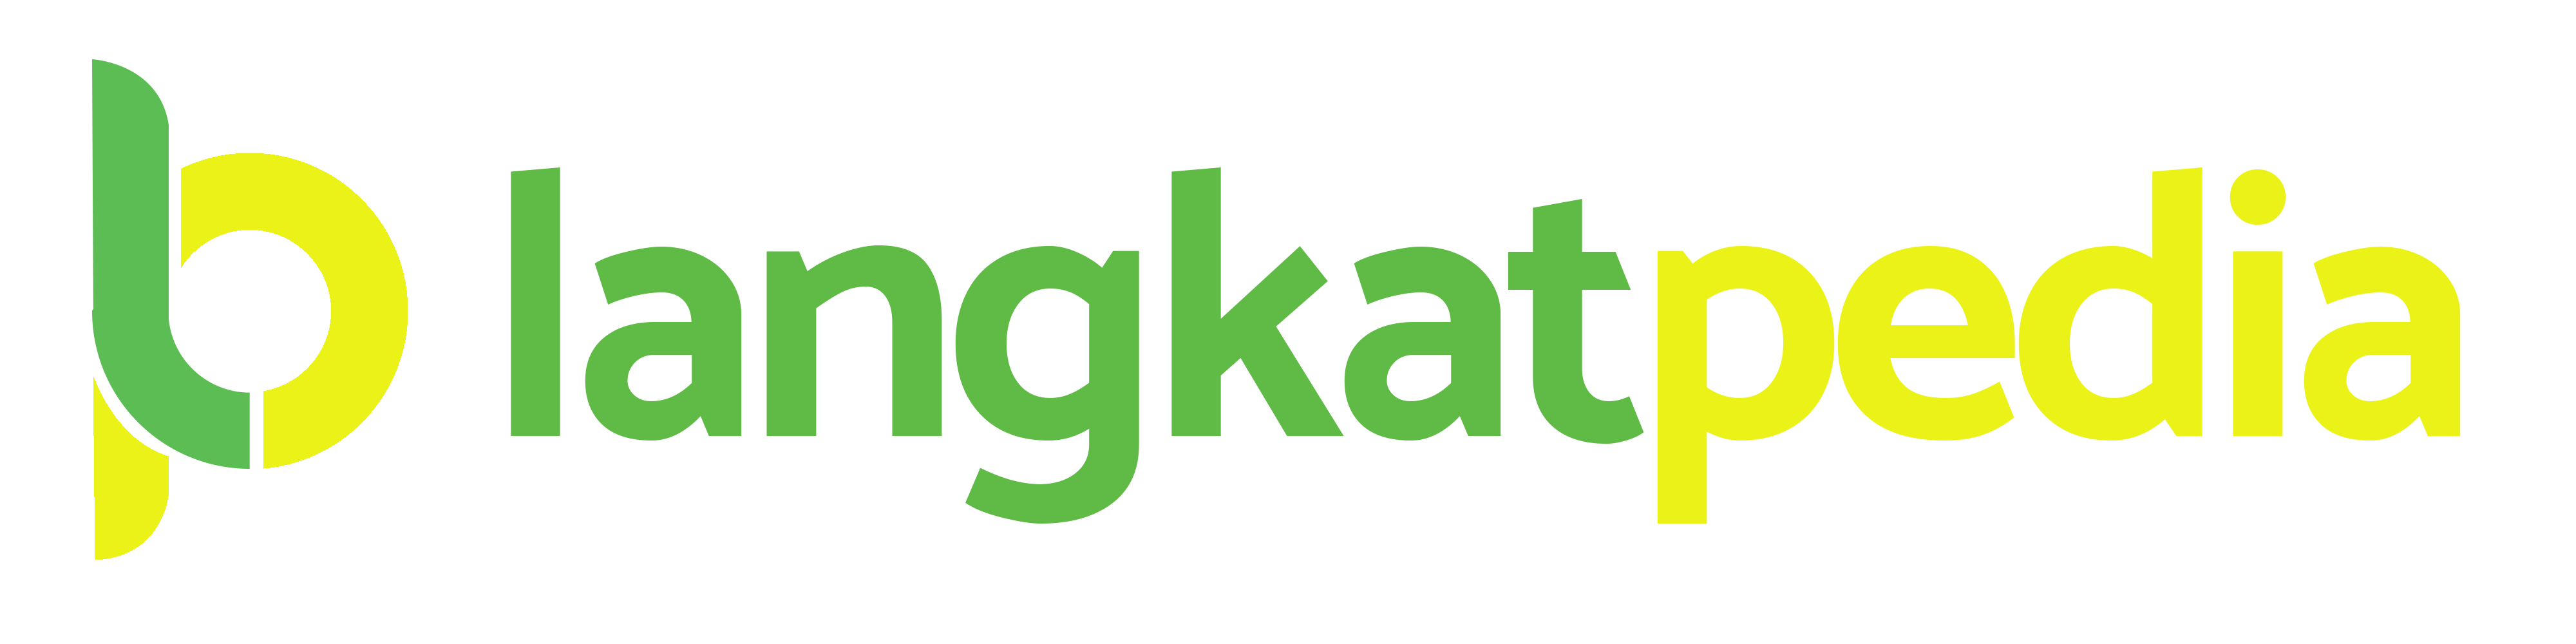 Langkatpedia